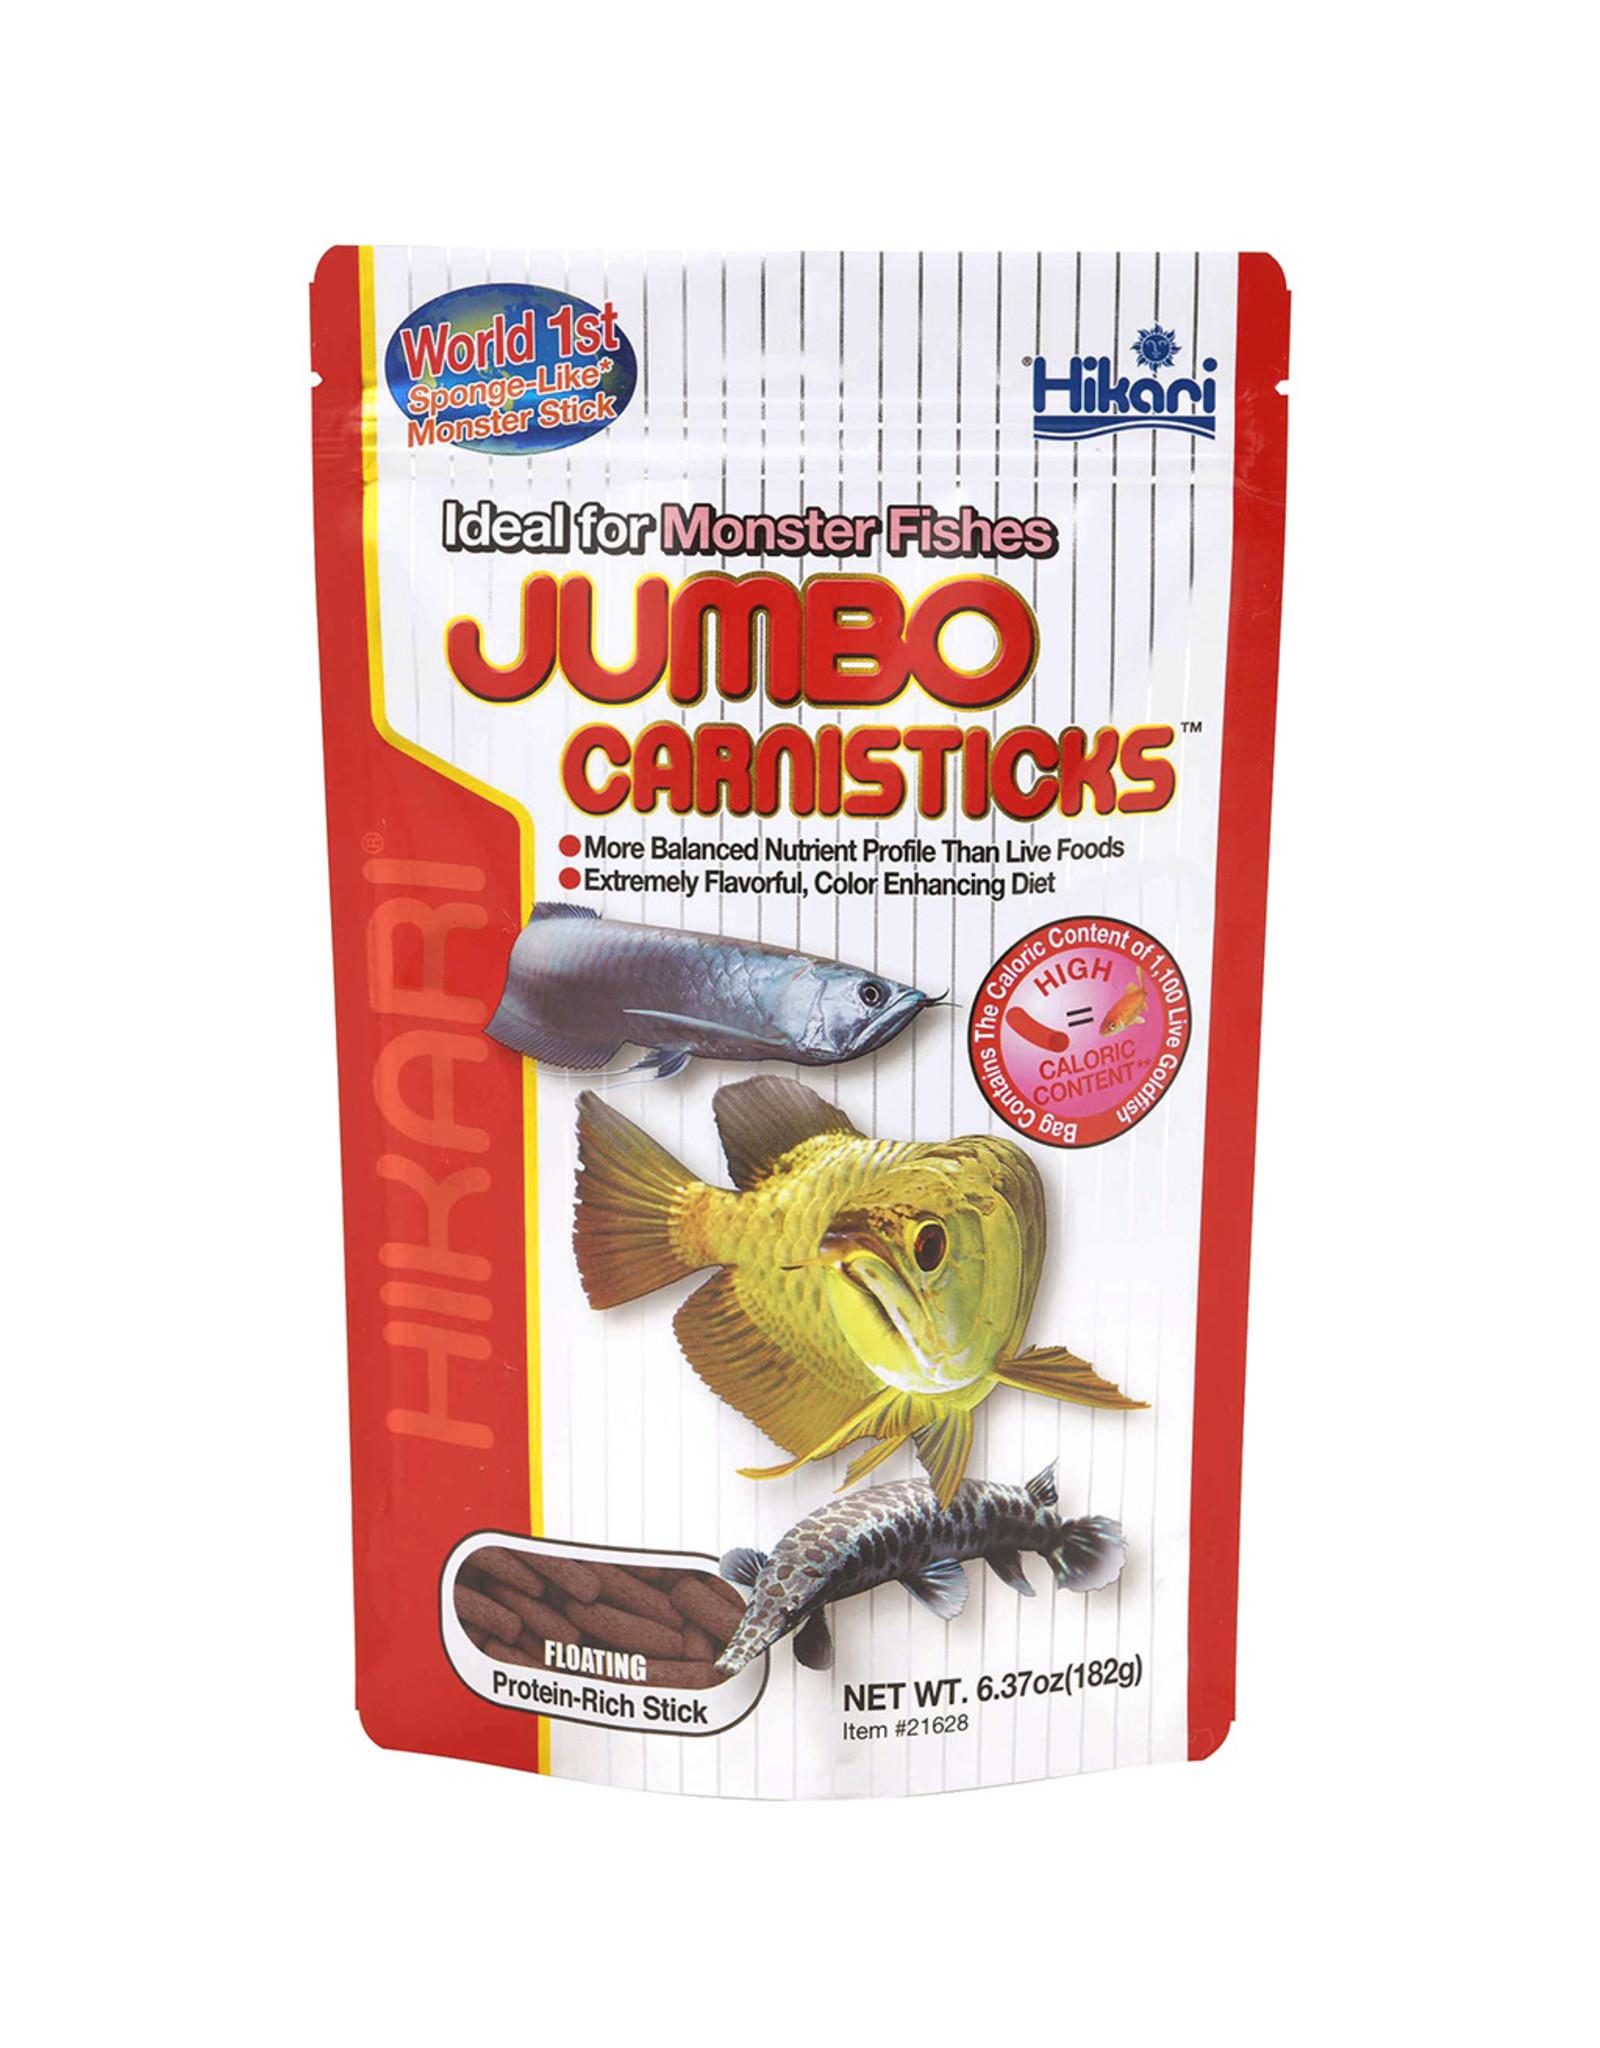 Hikari Sales USA, Inc. HIKARI Tropical Carnisticks Jumbo 6.37oz